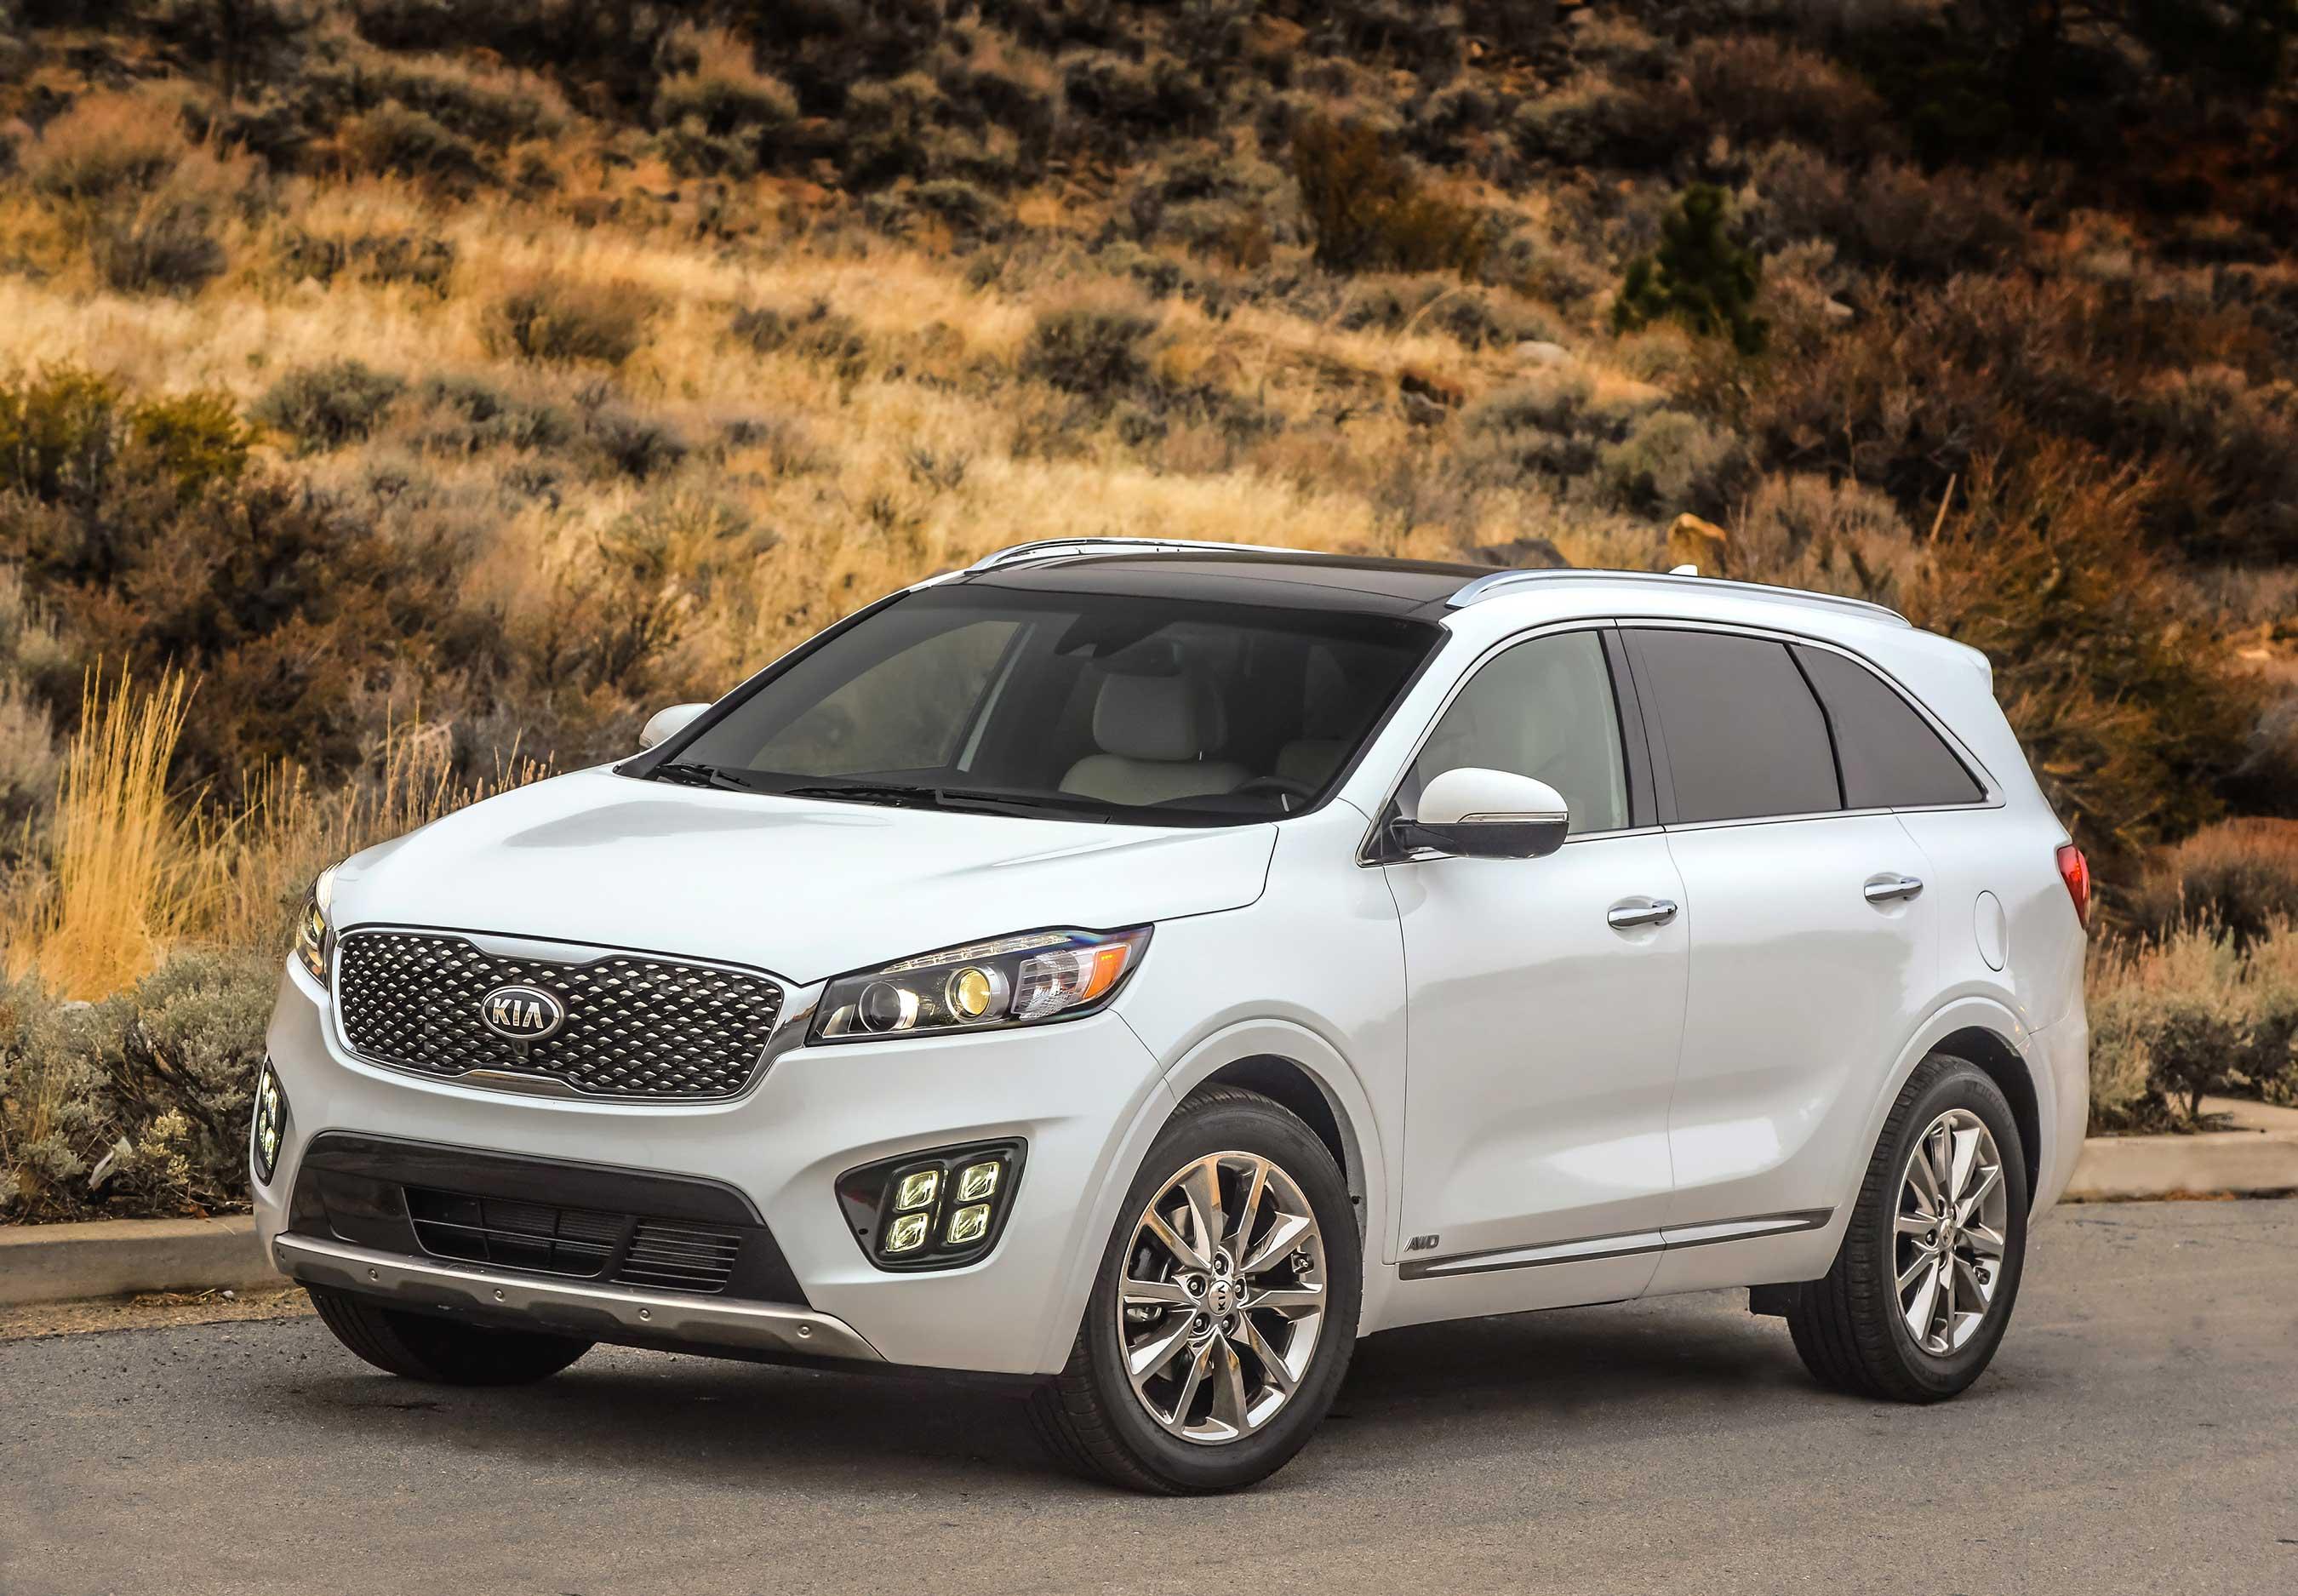 Kia Sorento attains the J.D. Power Initial Quality Study (IQS) award in the Midsize SUV segment.